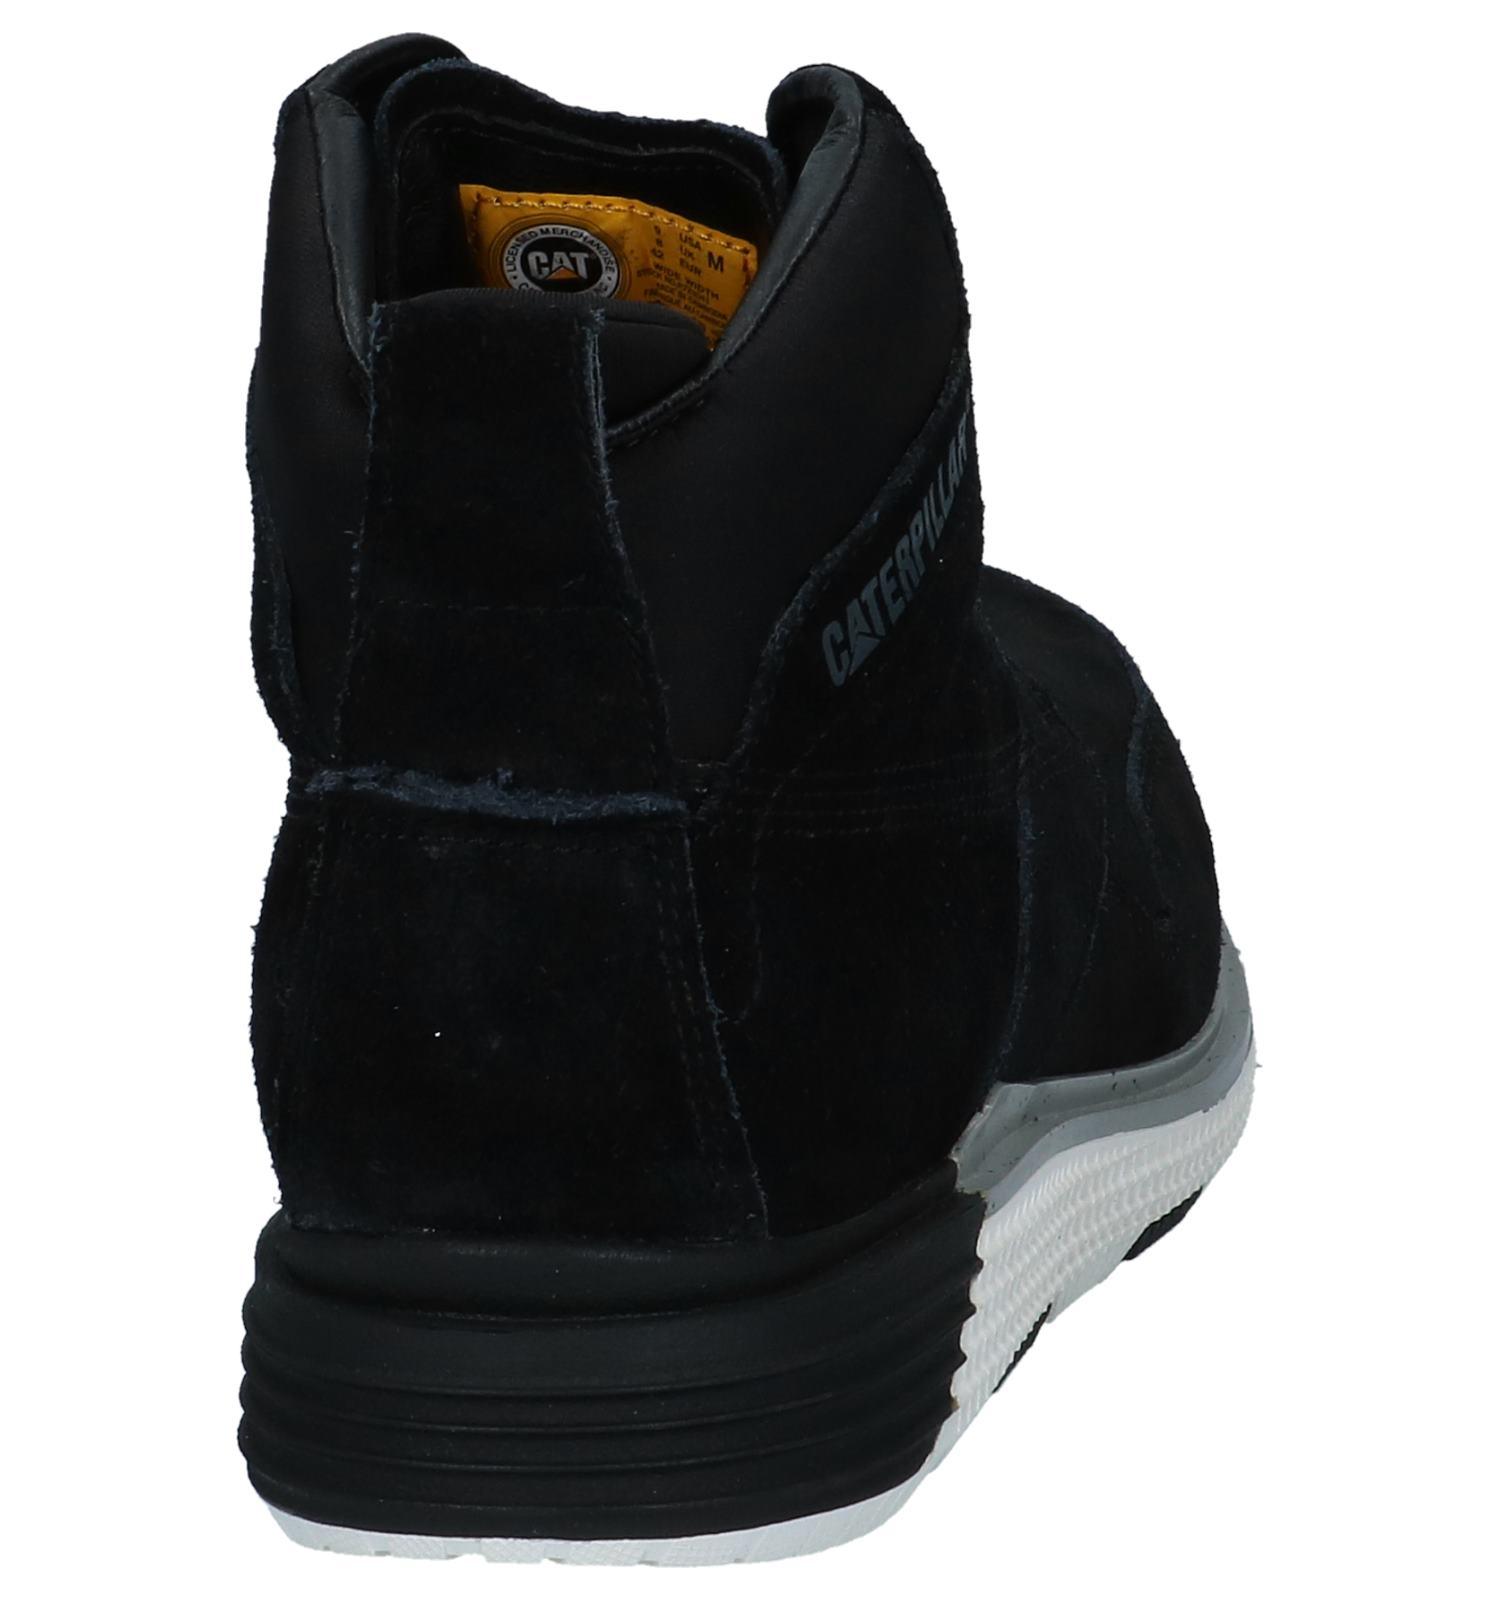 Hoge Zwarte Schoenen Schoenen Caterpillar Zwarte Make Hoge GpqSzMVjLU